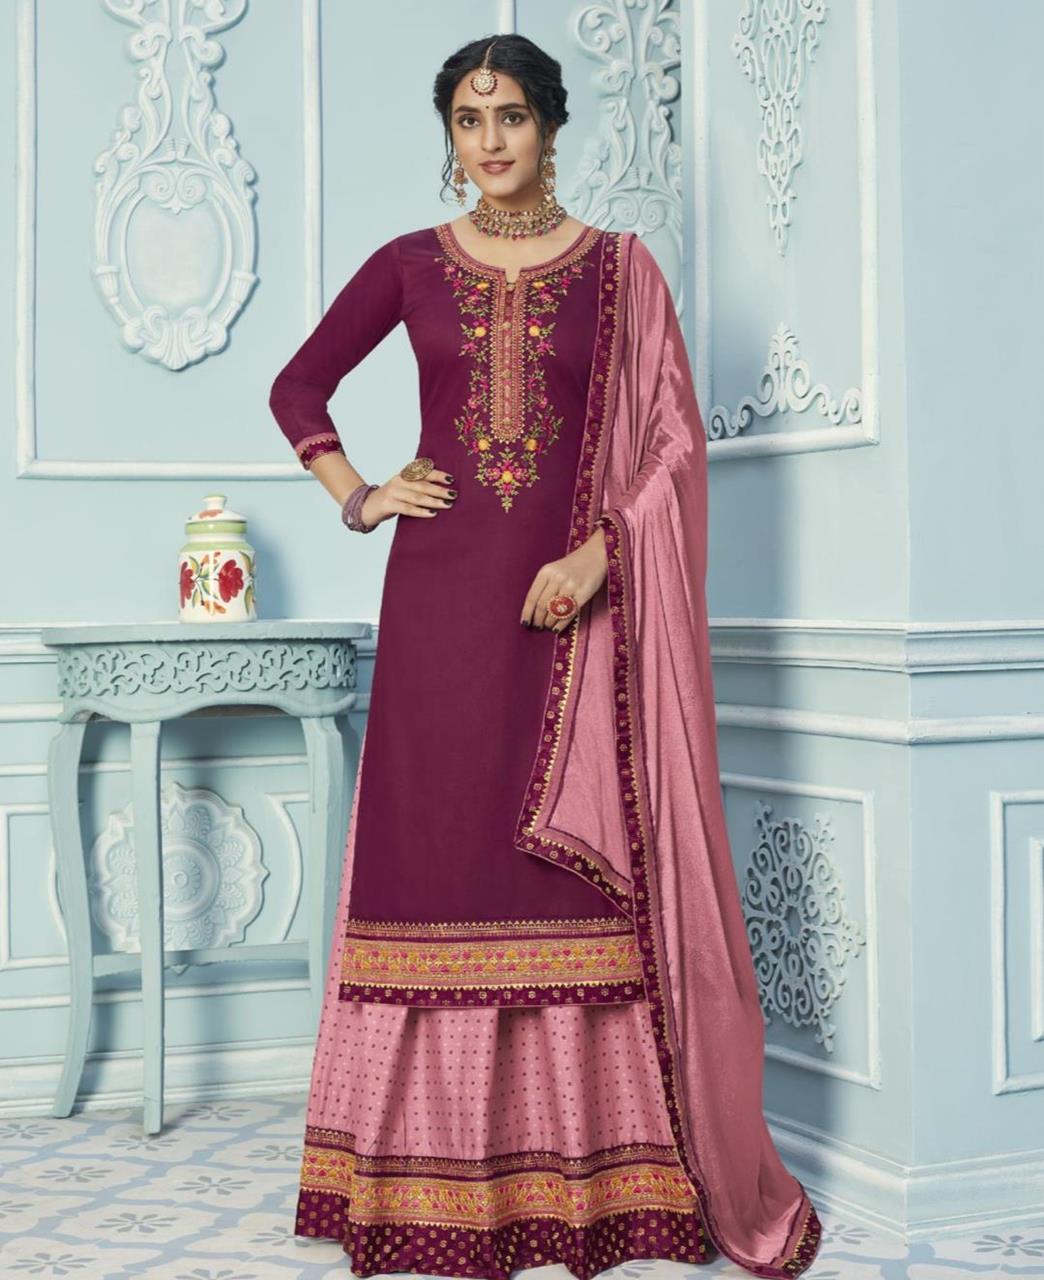 Embroidered Cotton Straight cut Salwar Kameez in Purple